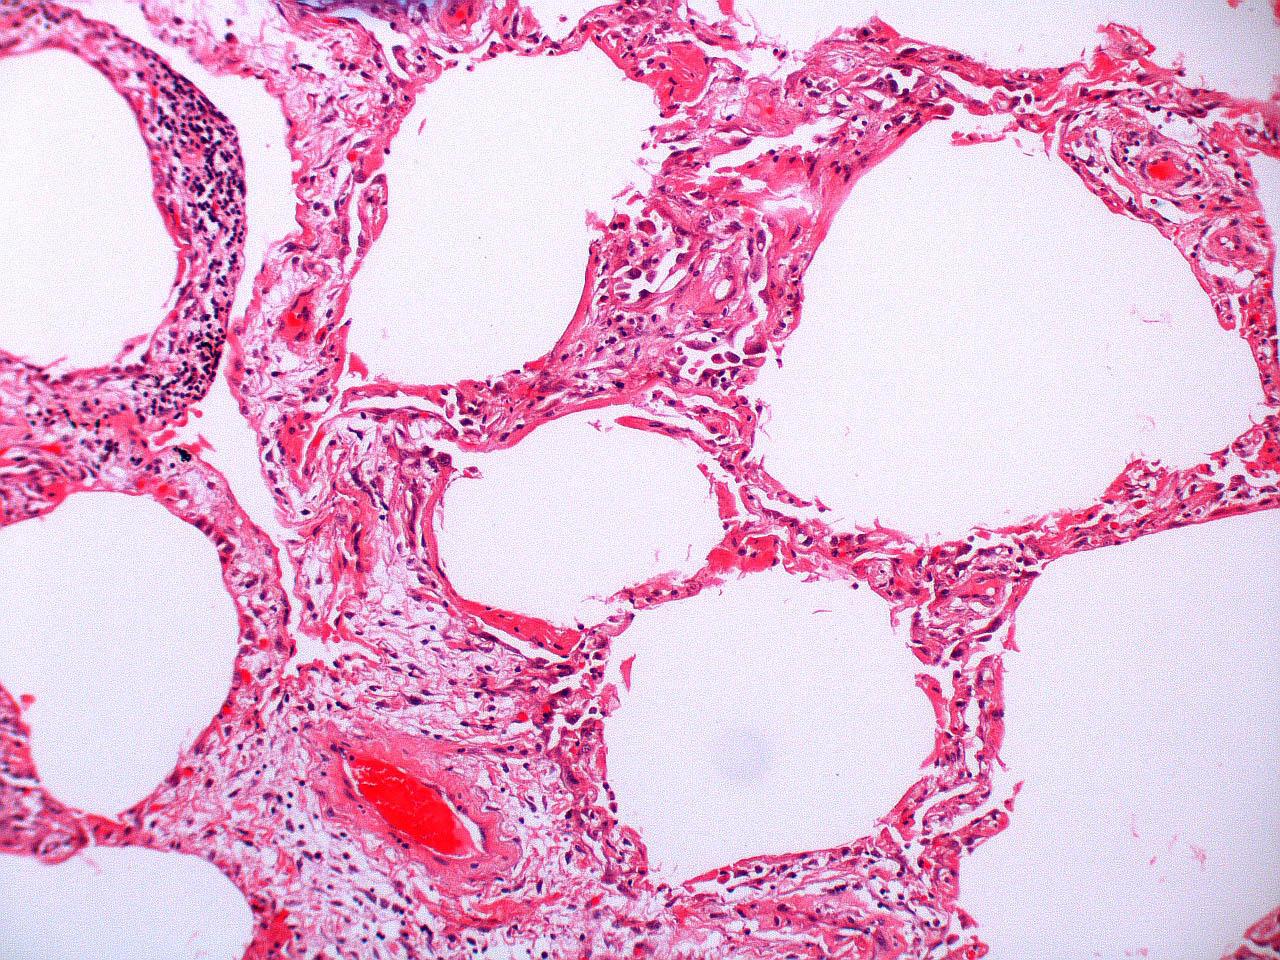 Fibroblastic proliferation